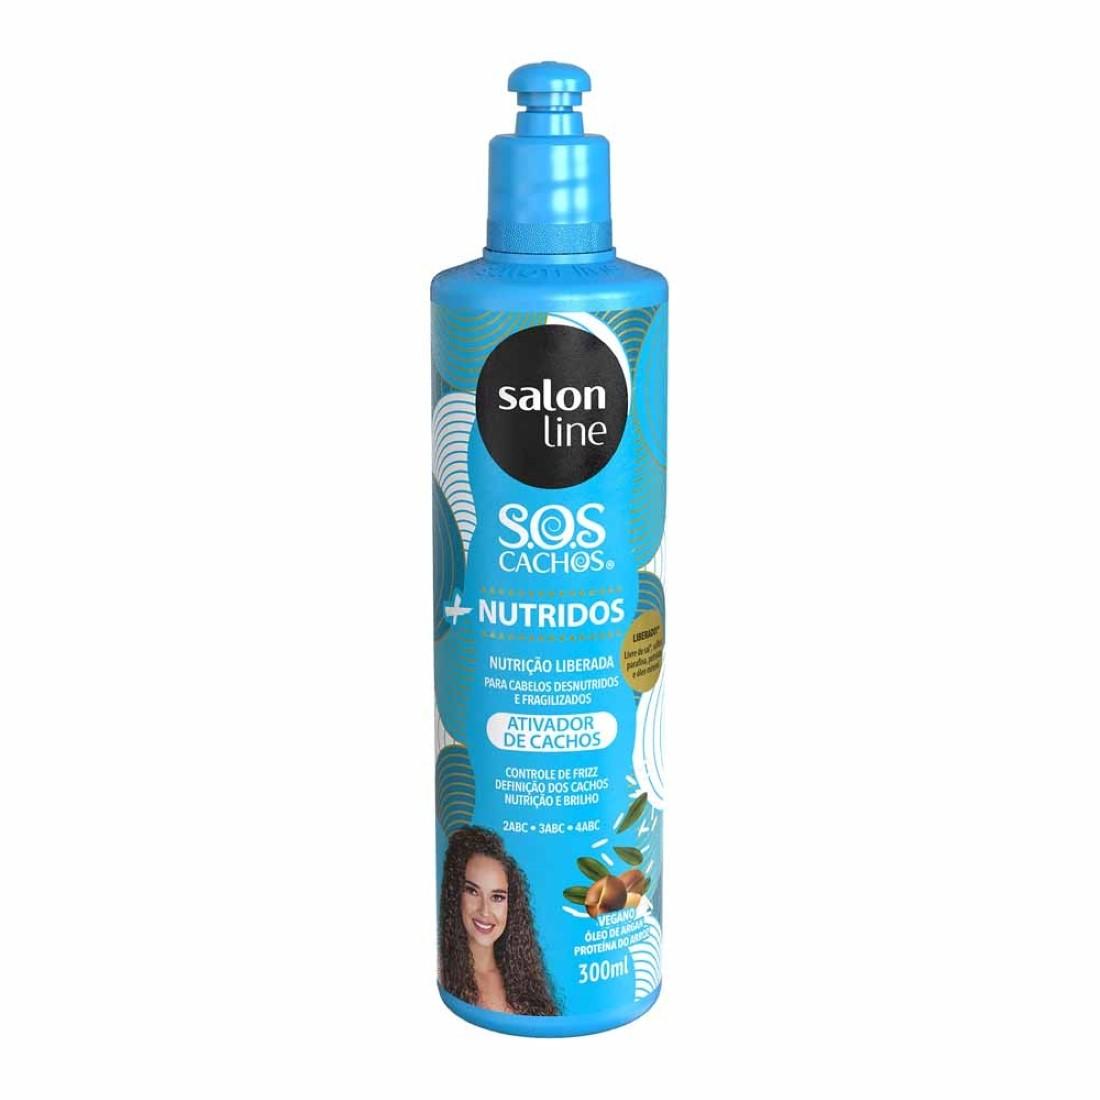 Ativador de Cachos S.O.S Cachos Argan 300ml - Salon Line